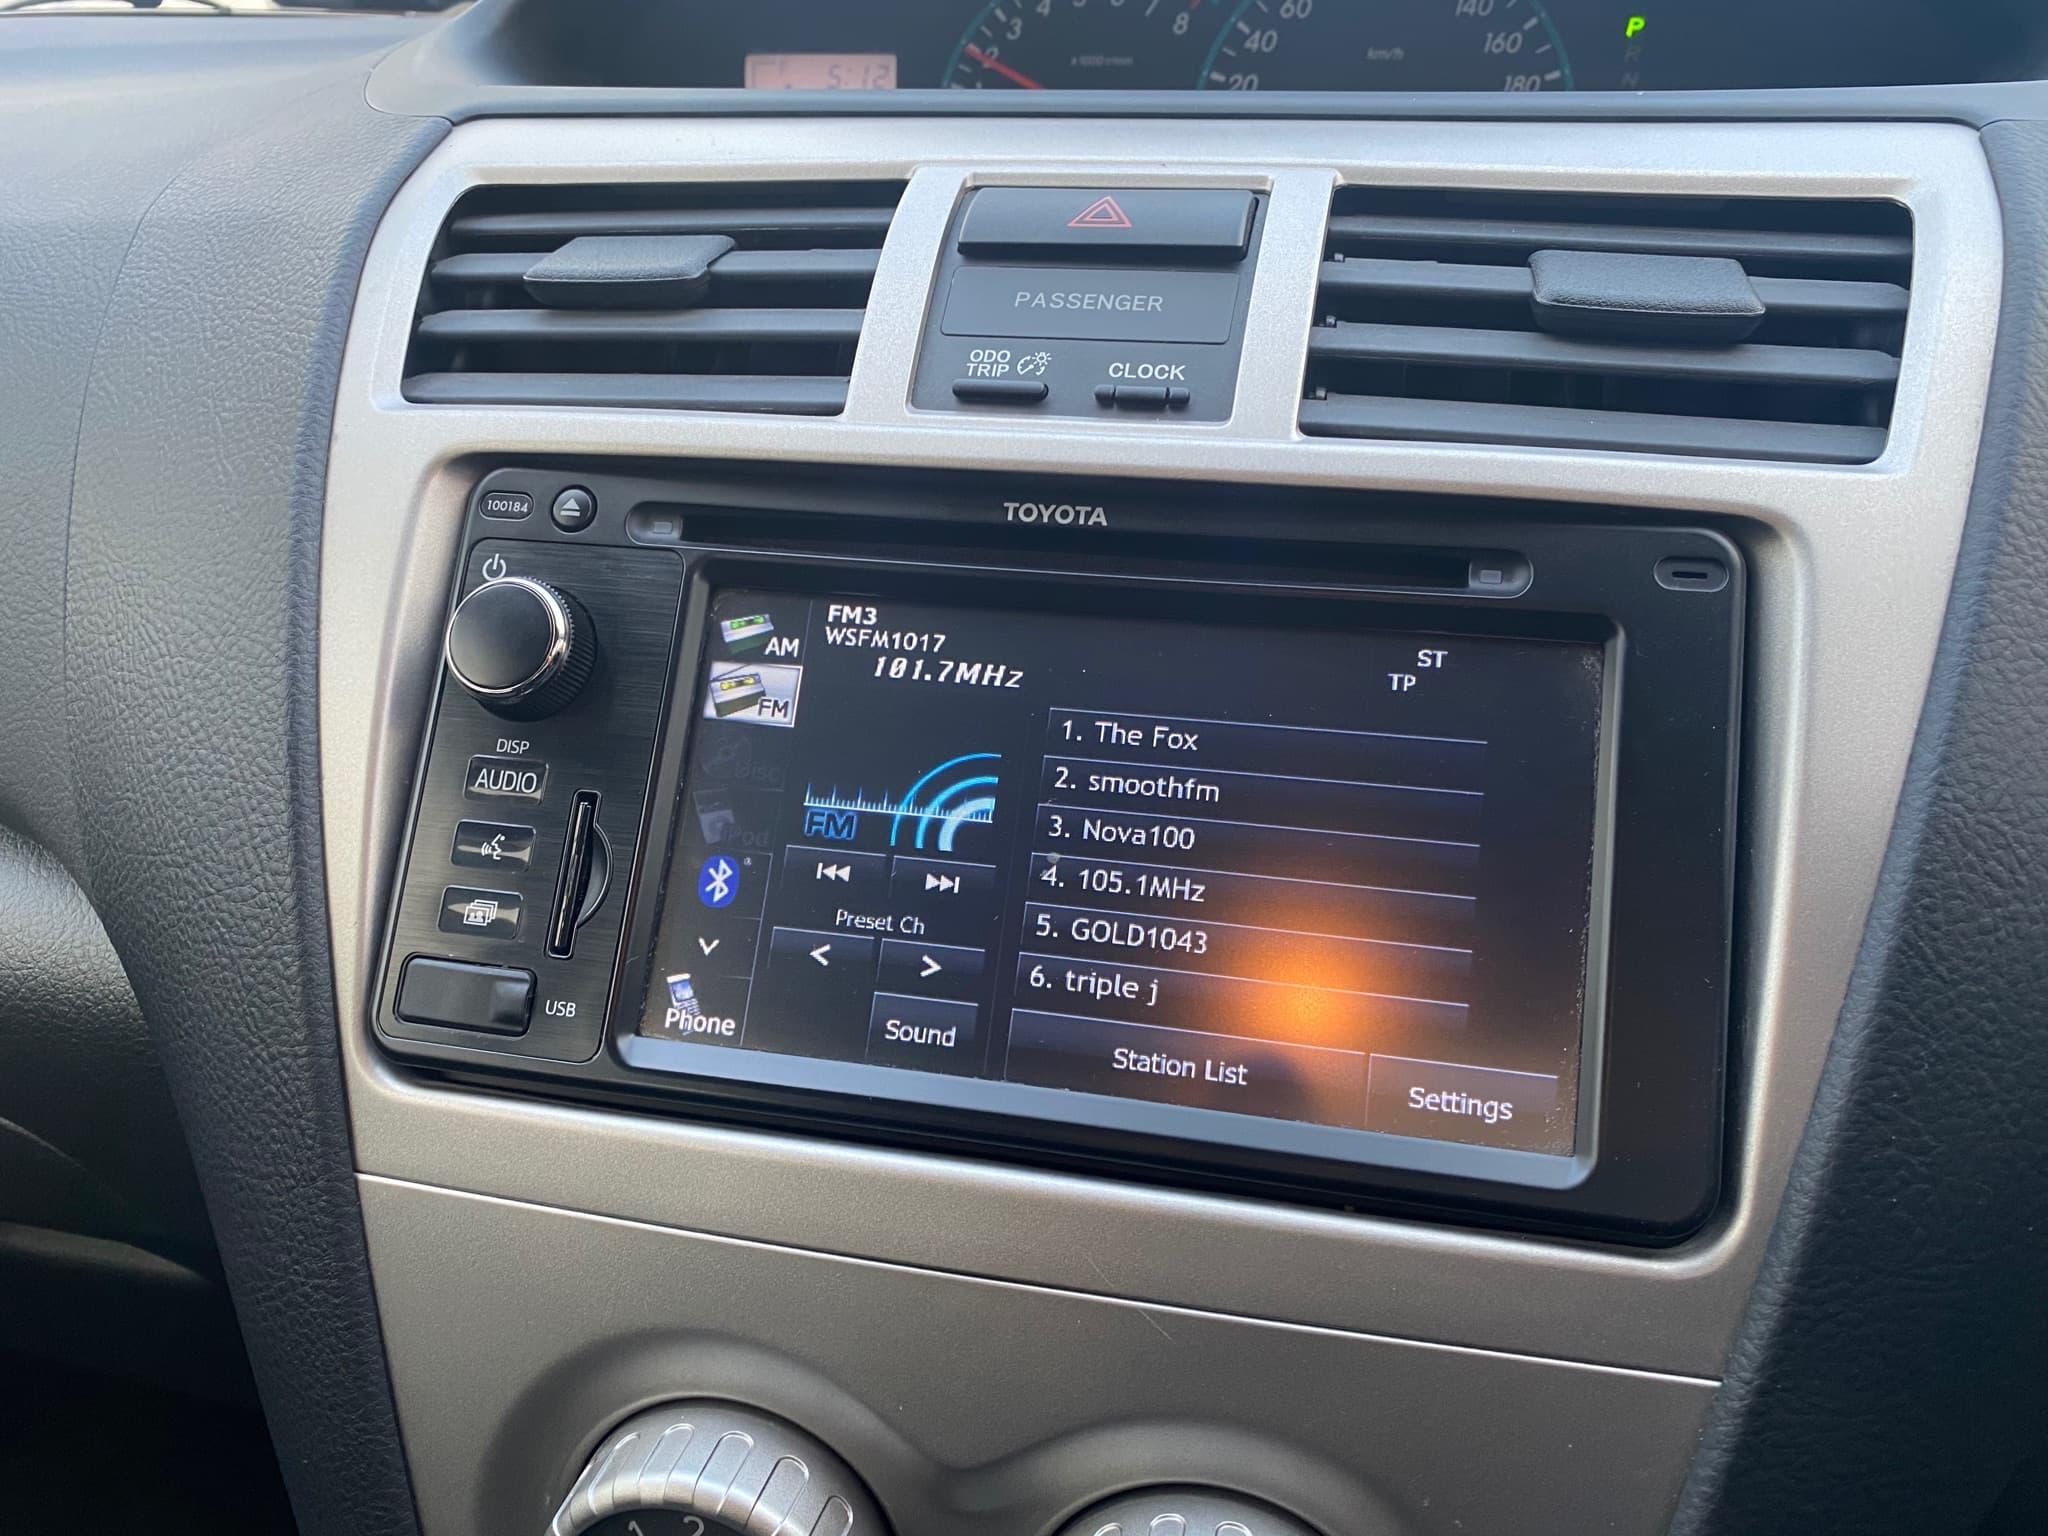 2016 Toyota Yaris YRS Auto - image 14